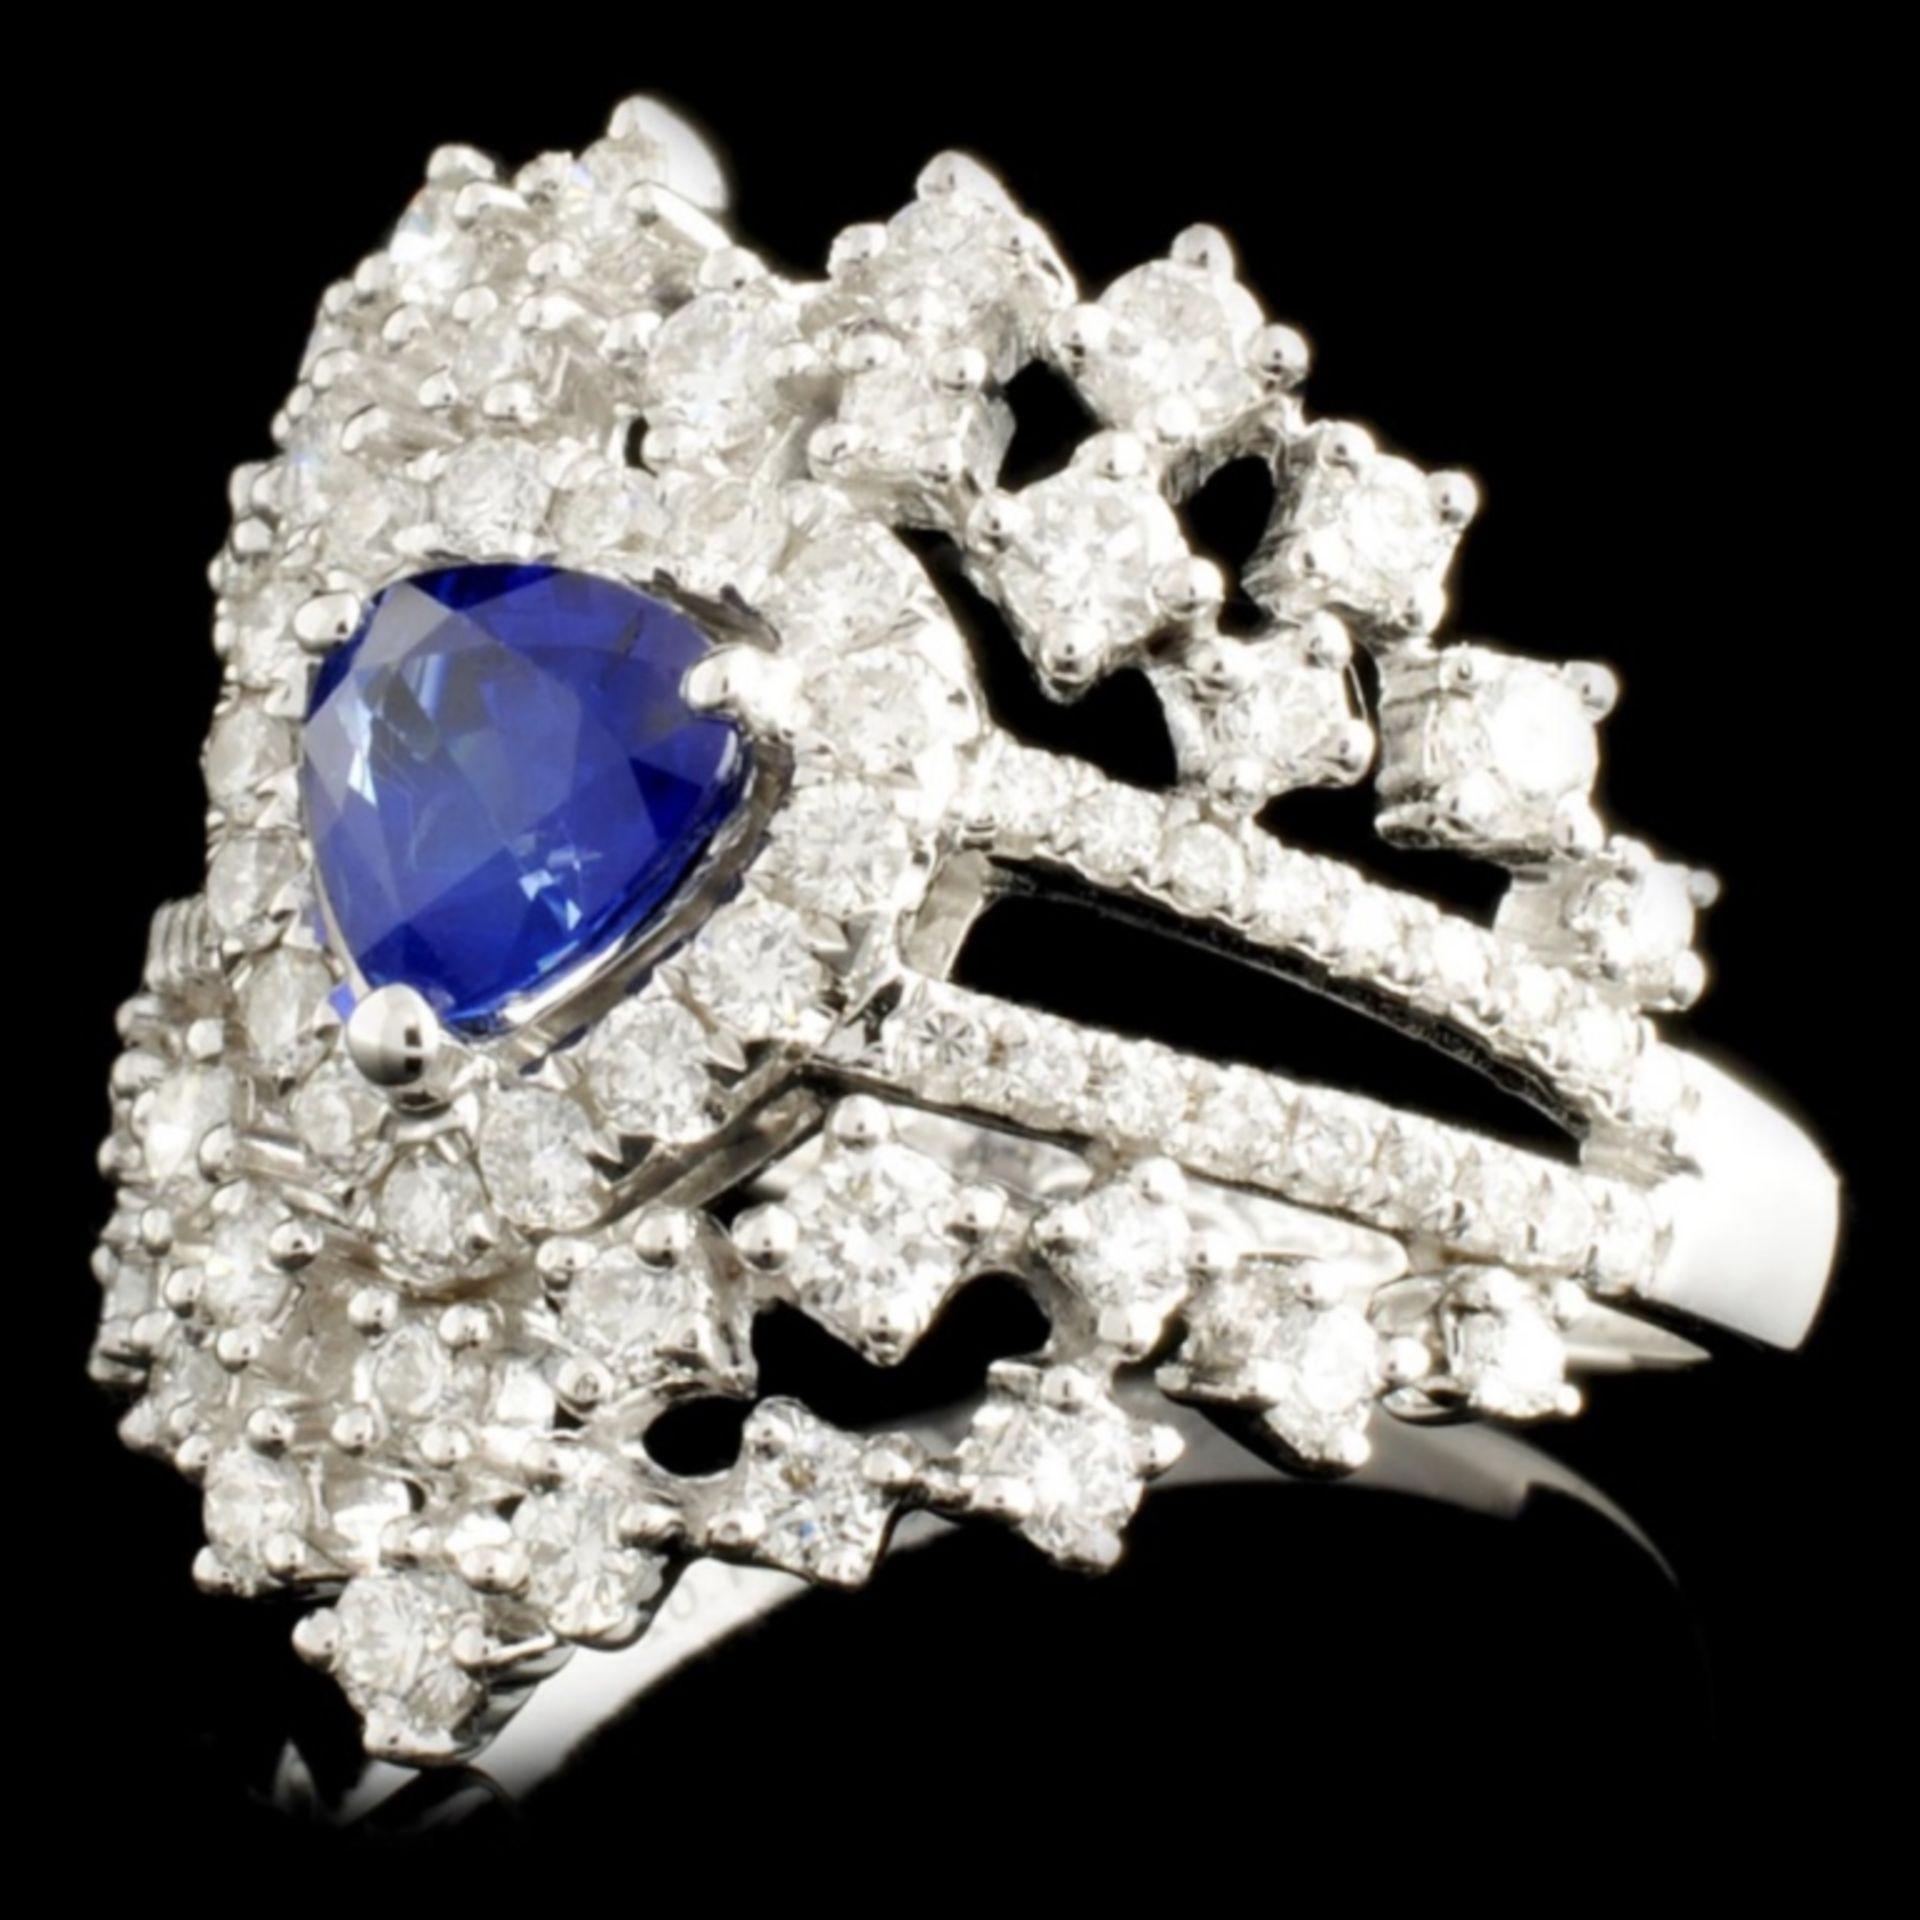 18K Gold 0.83ct Sapphire & 1.02ctw Diamond Ring - Image 2 of 4